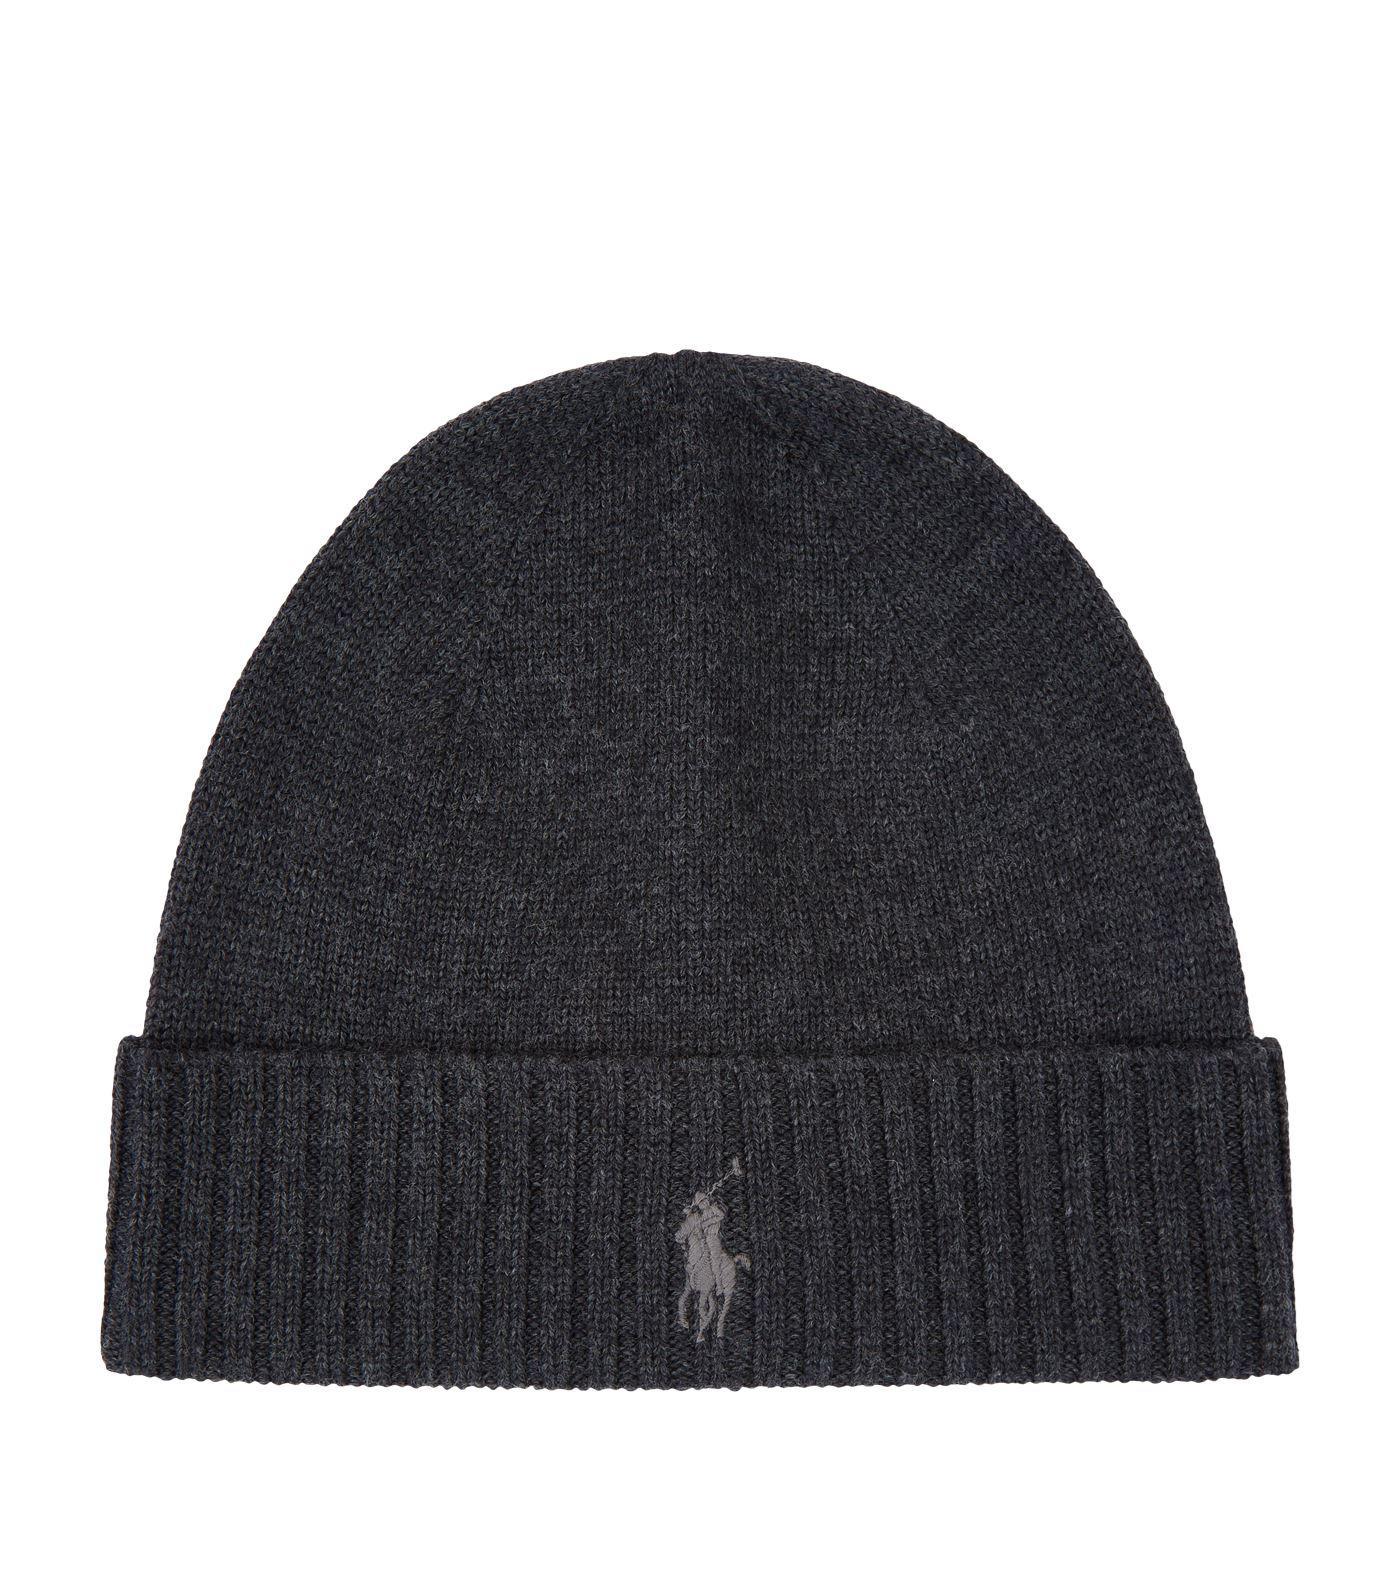 Polo Ralph Lauren Merino Wool Ribbed Beanie Hat in Gray for Men ... 7769eb0fa52b